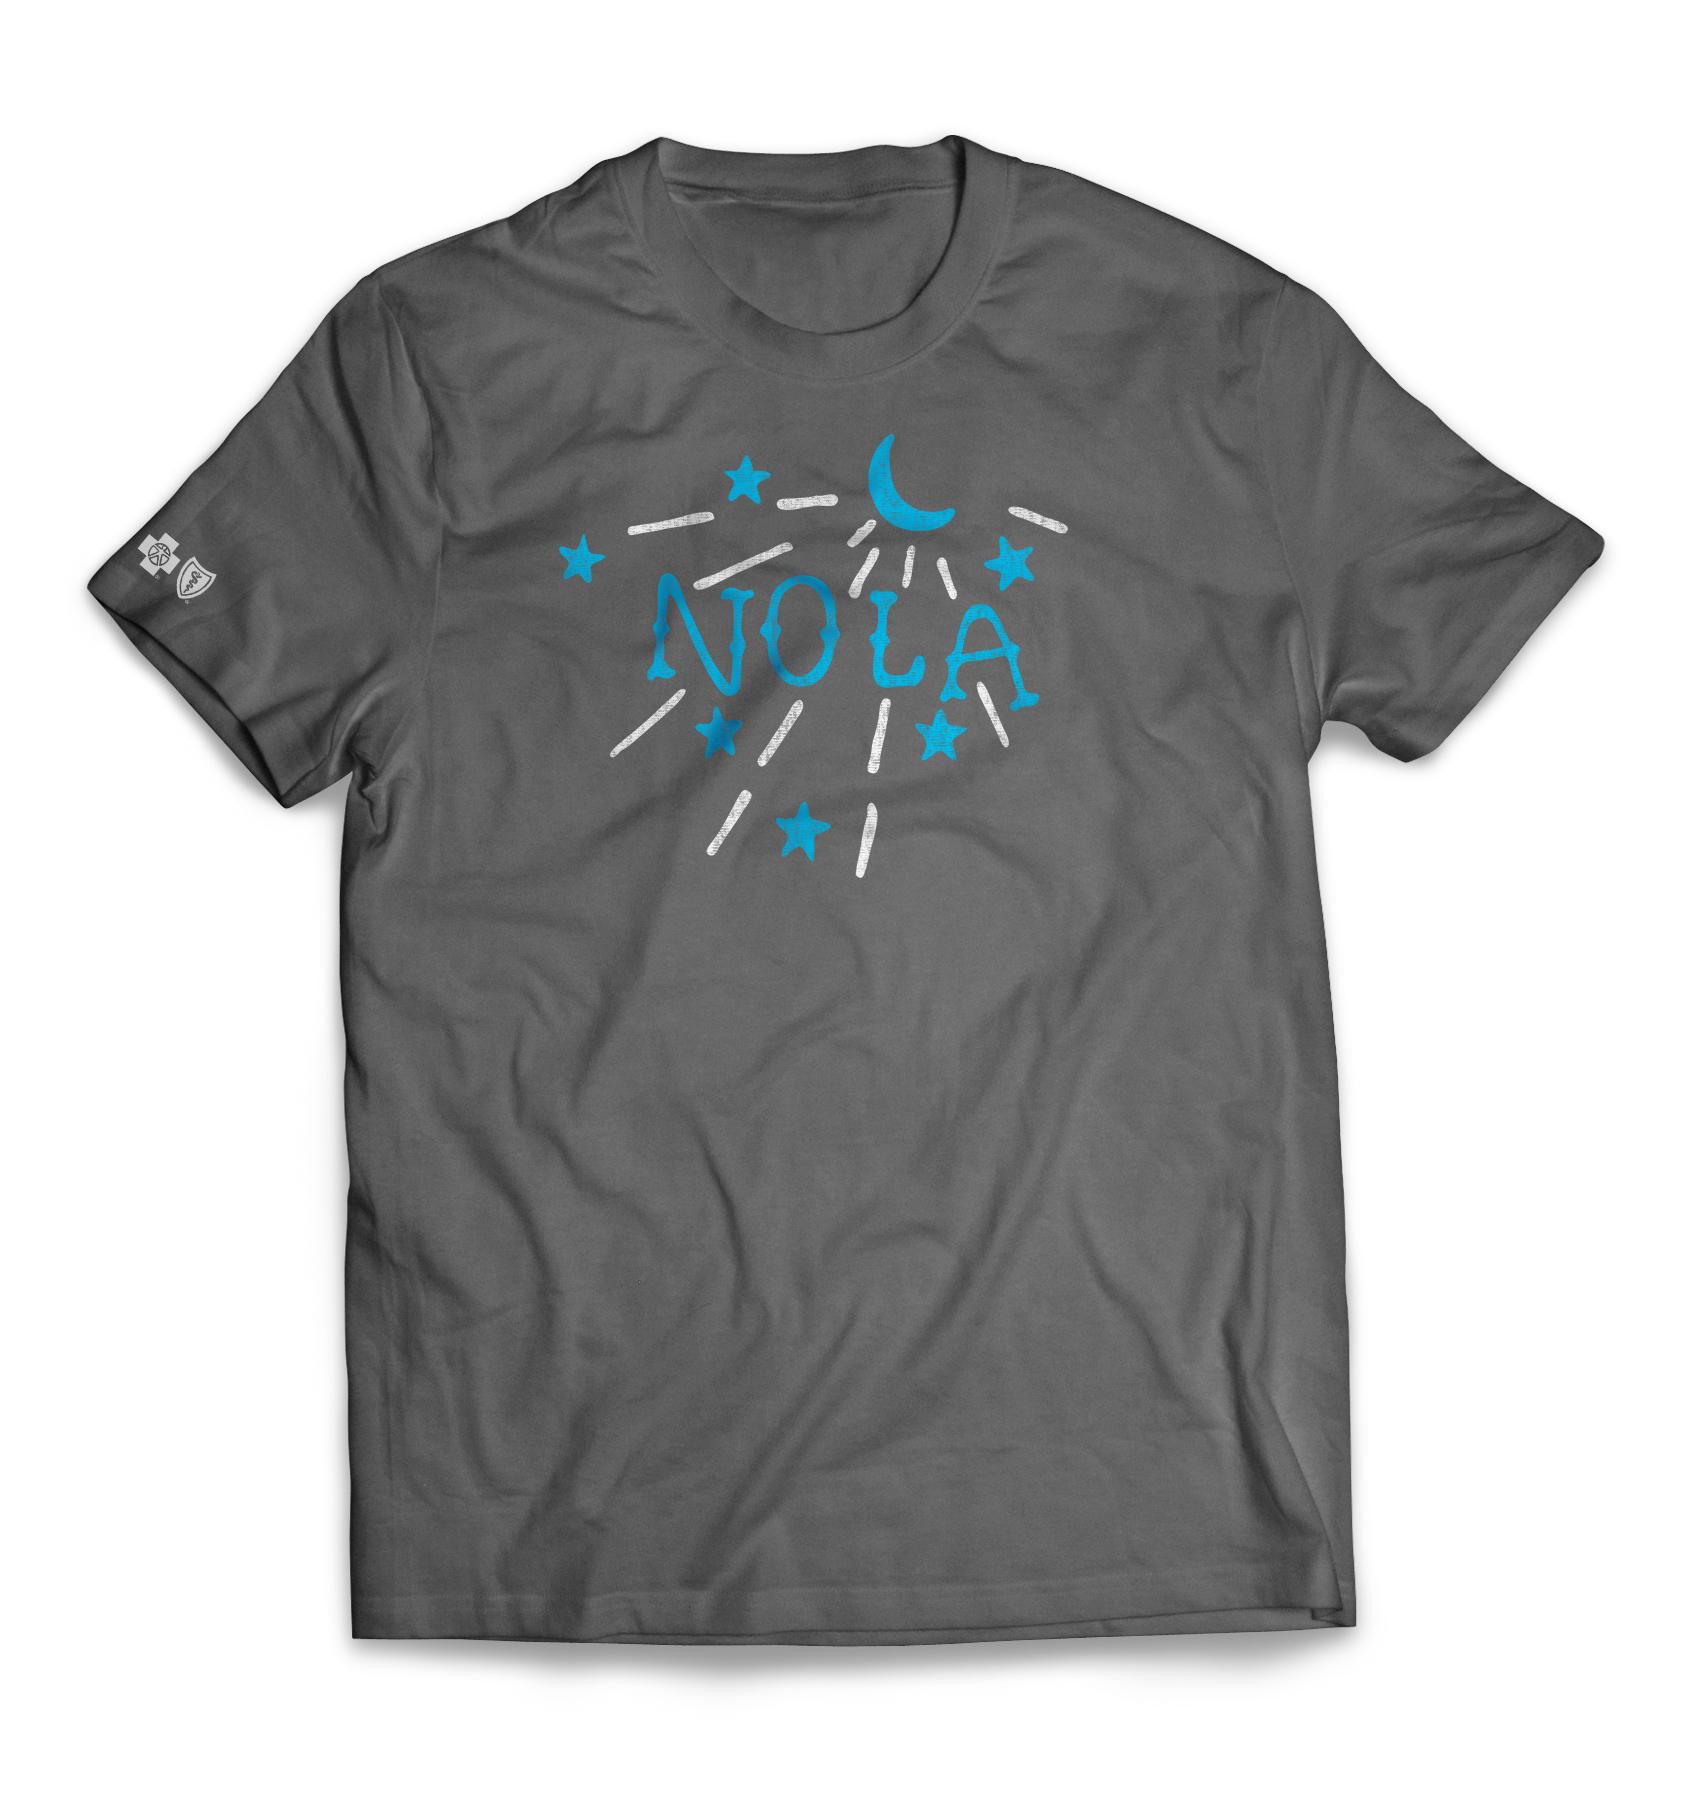 BBNOLA_T-Shirt_Front_2